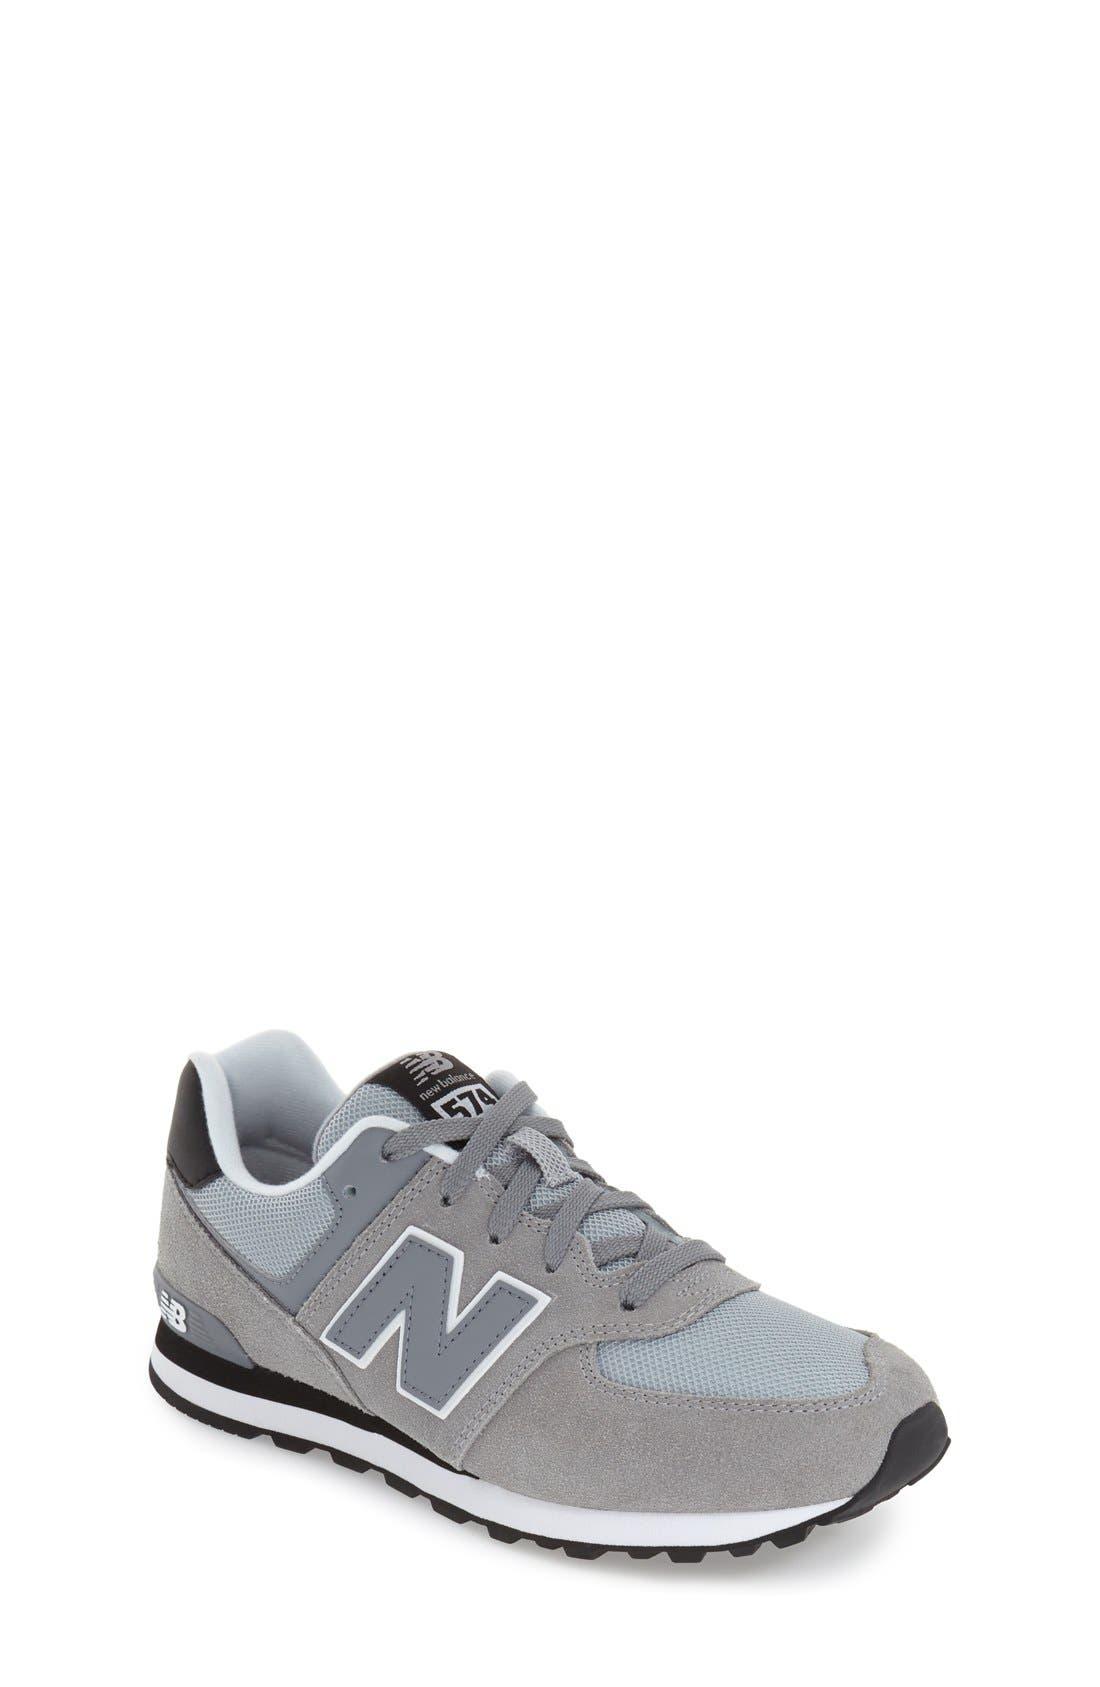 Alternate Image 1 Selected - New Balance '574 Core Plus' Sneaker (Baby, Walker, Toddler, Little Kid & Big Kid)